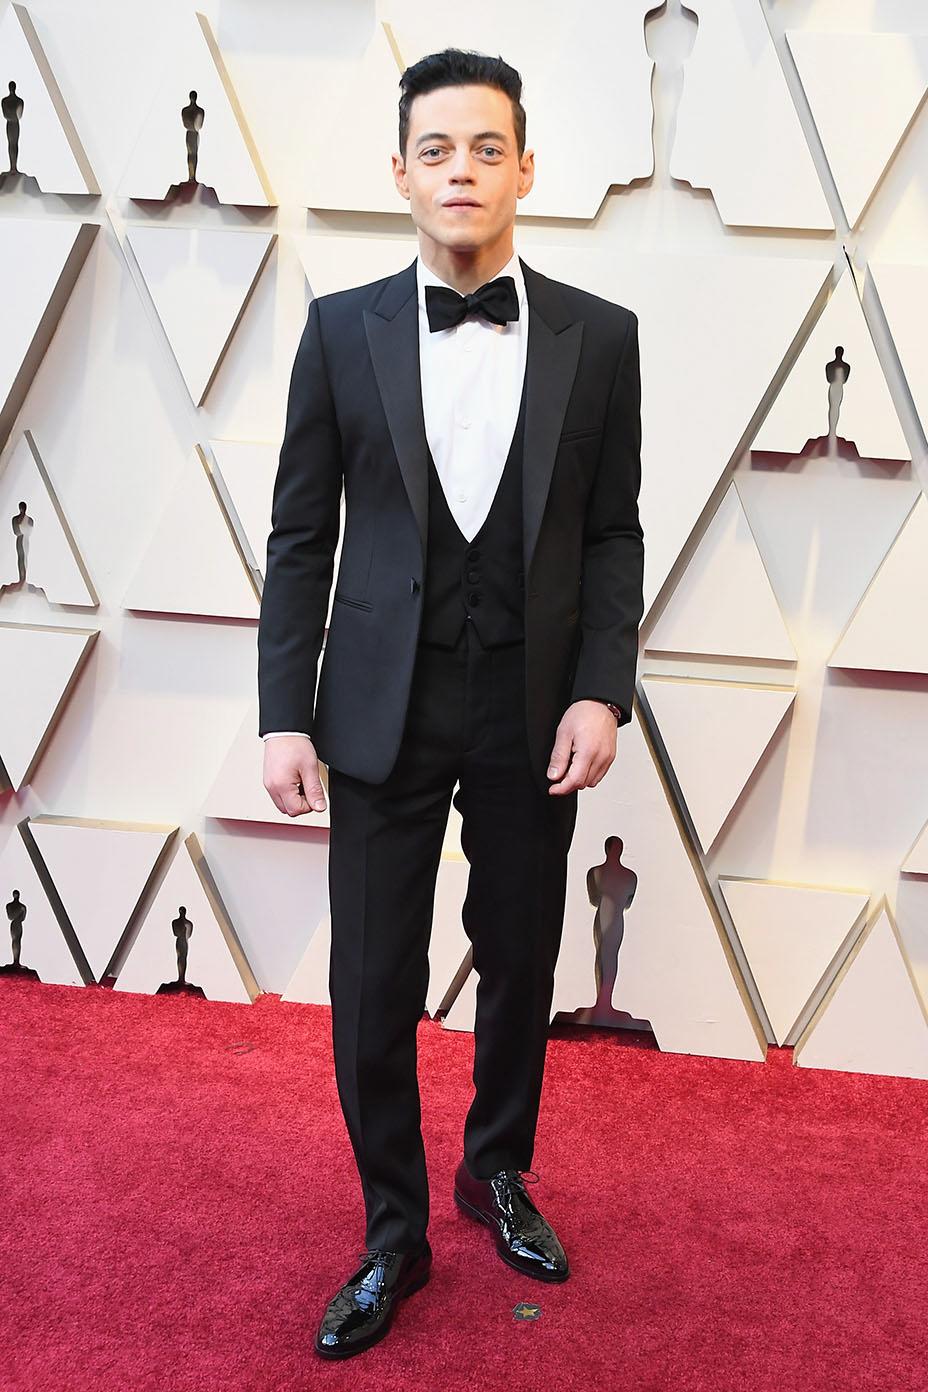 Die besten Oscar Looks 2019: Rami Malek